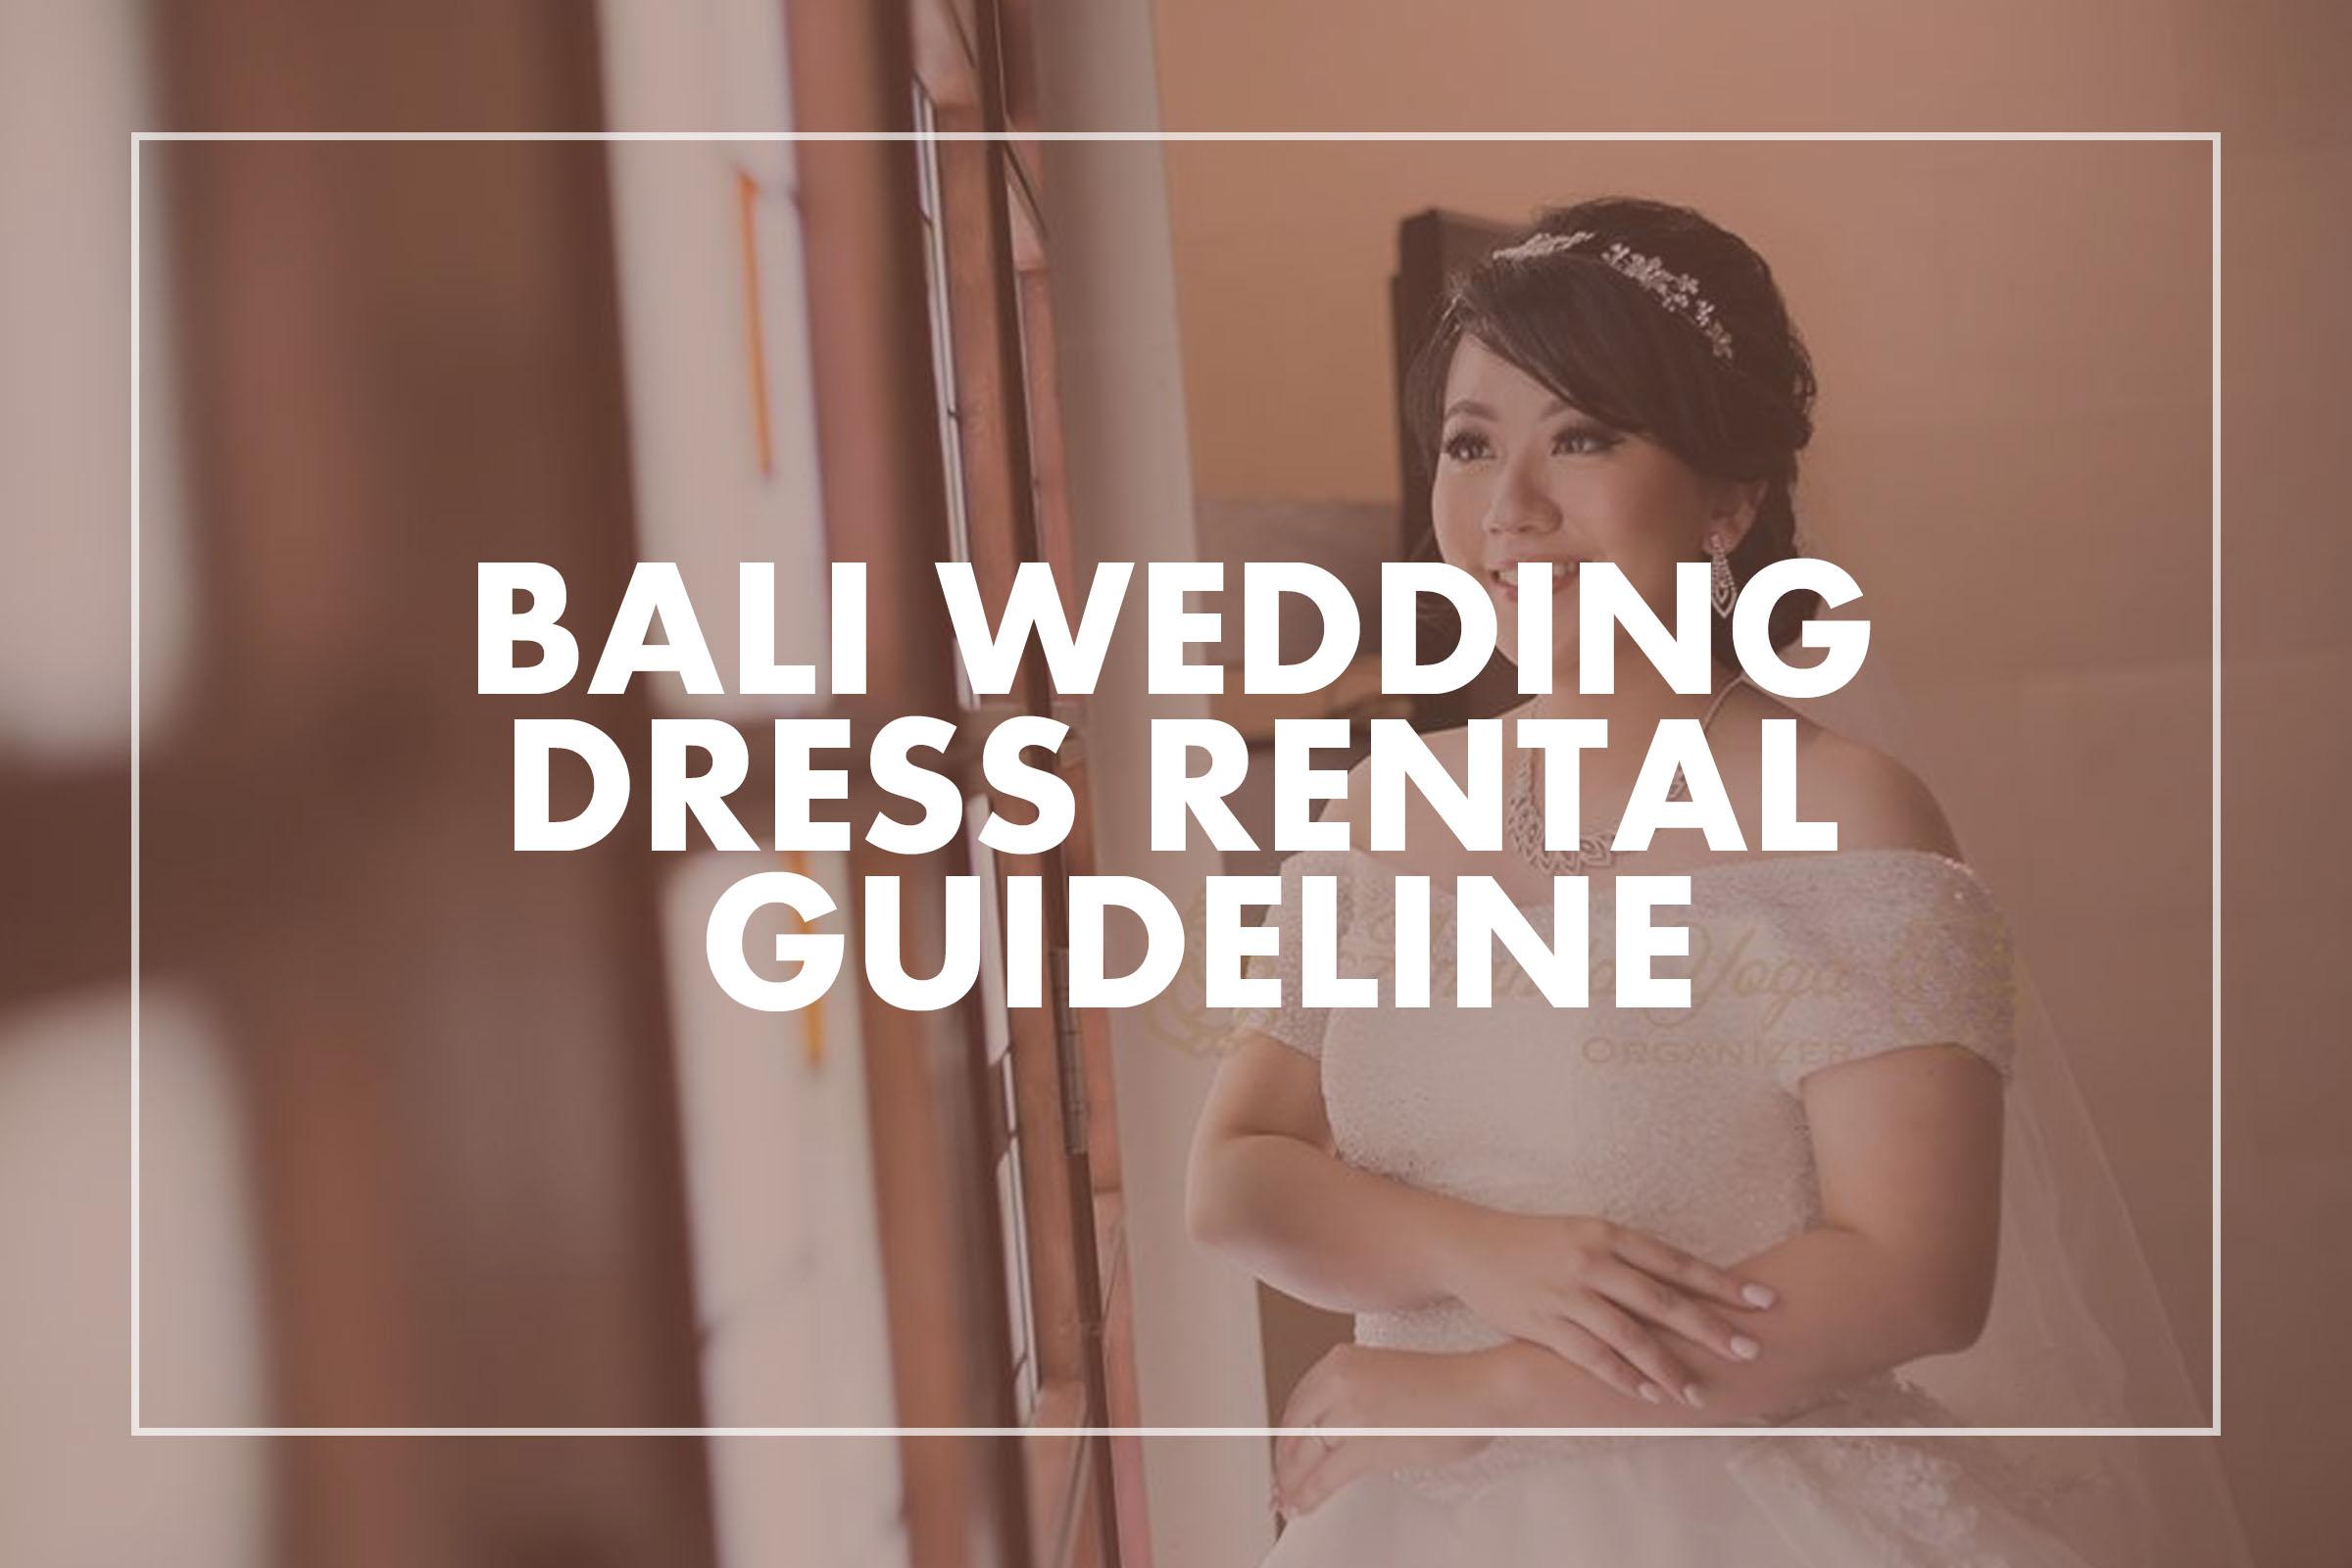 Bali Wedding Dress Rental